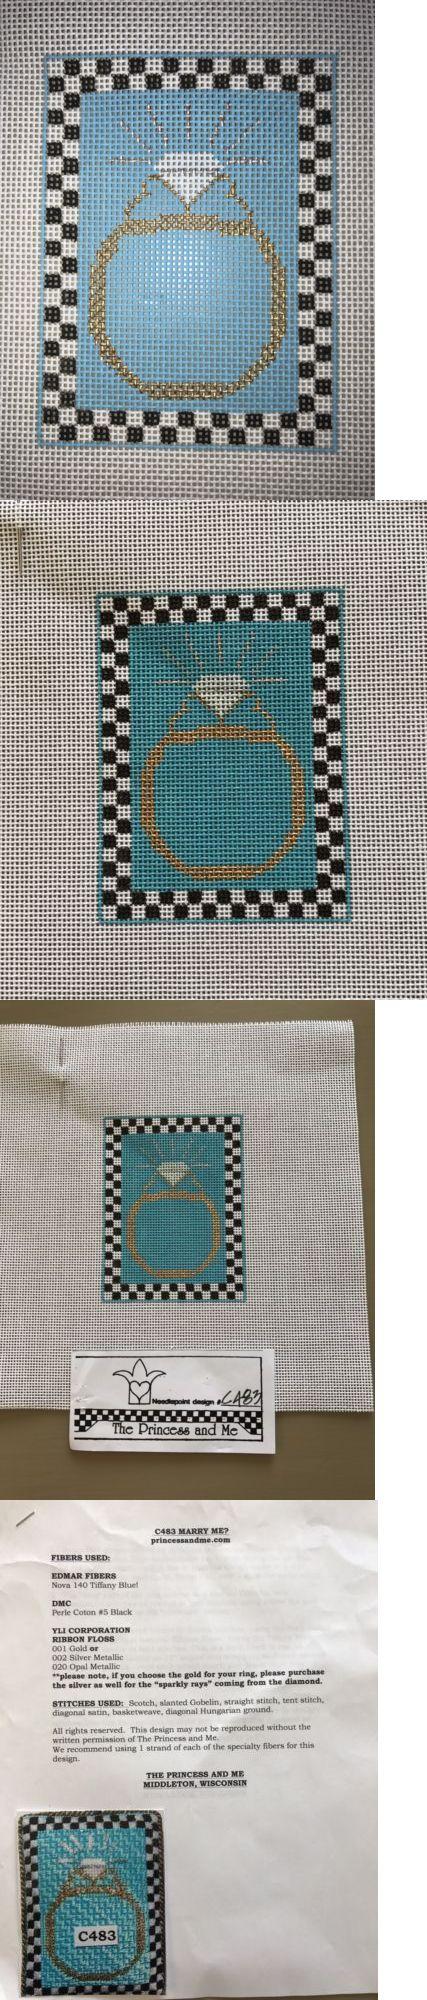 best 25  needlepoint kits ideas on pinterest